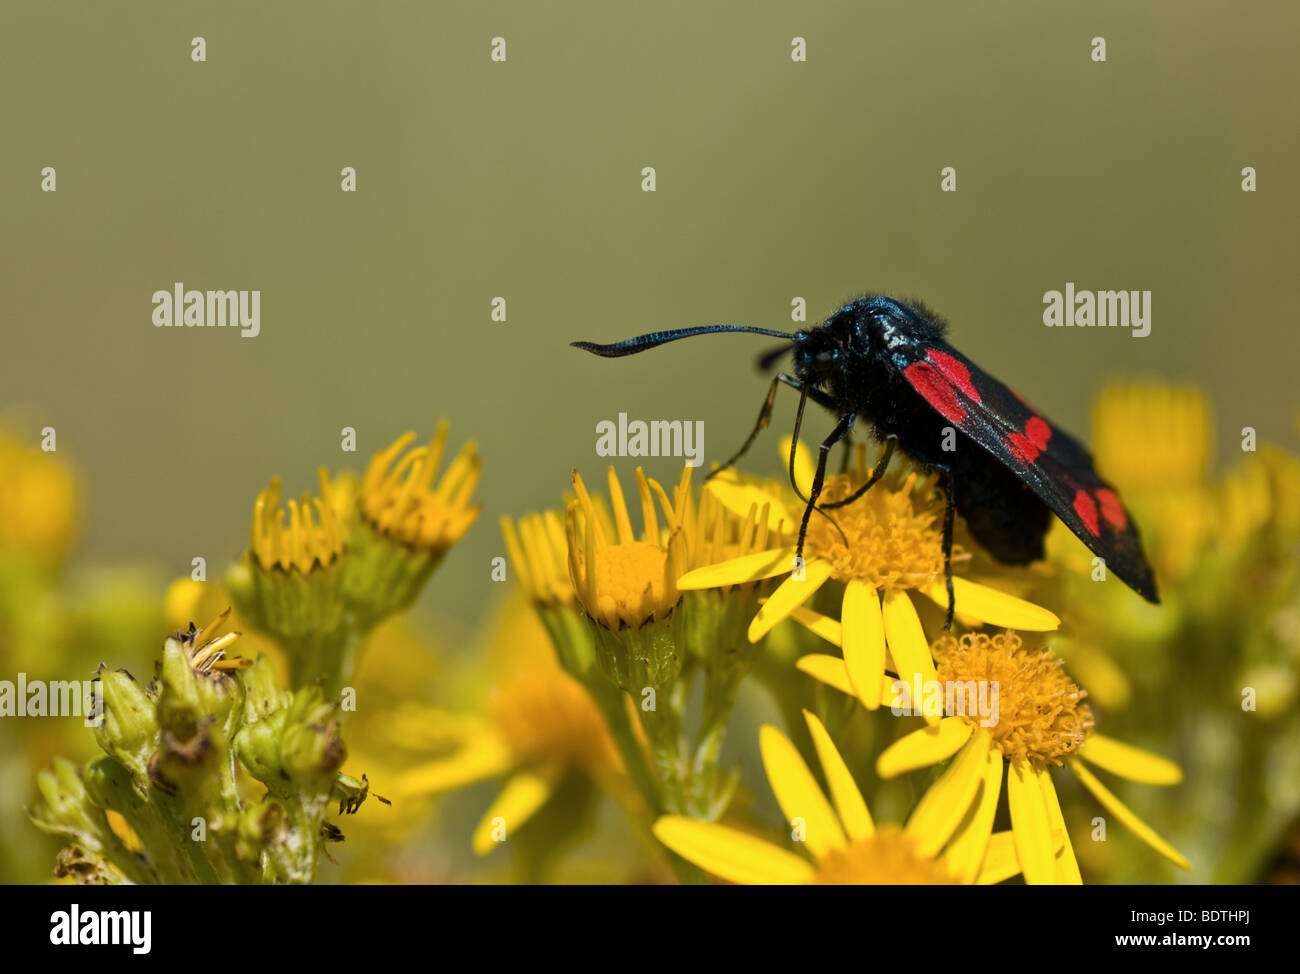 Polilla Six-Spot Burnett (Zygaena filipendulae) sobre hierba cana (Senecio jacobaea) Foto de stock